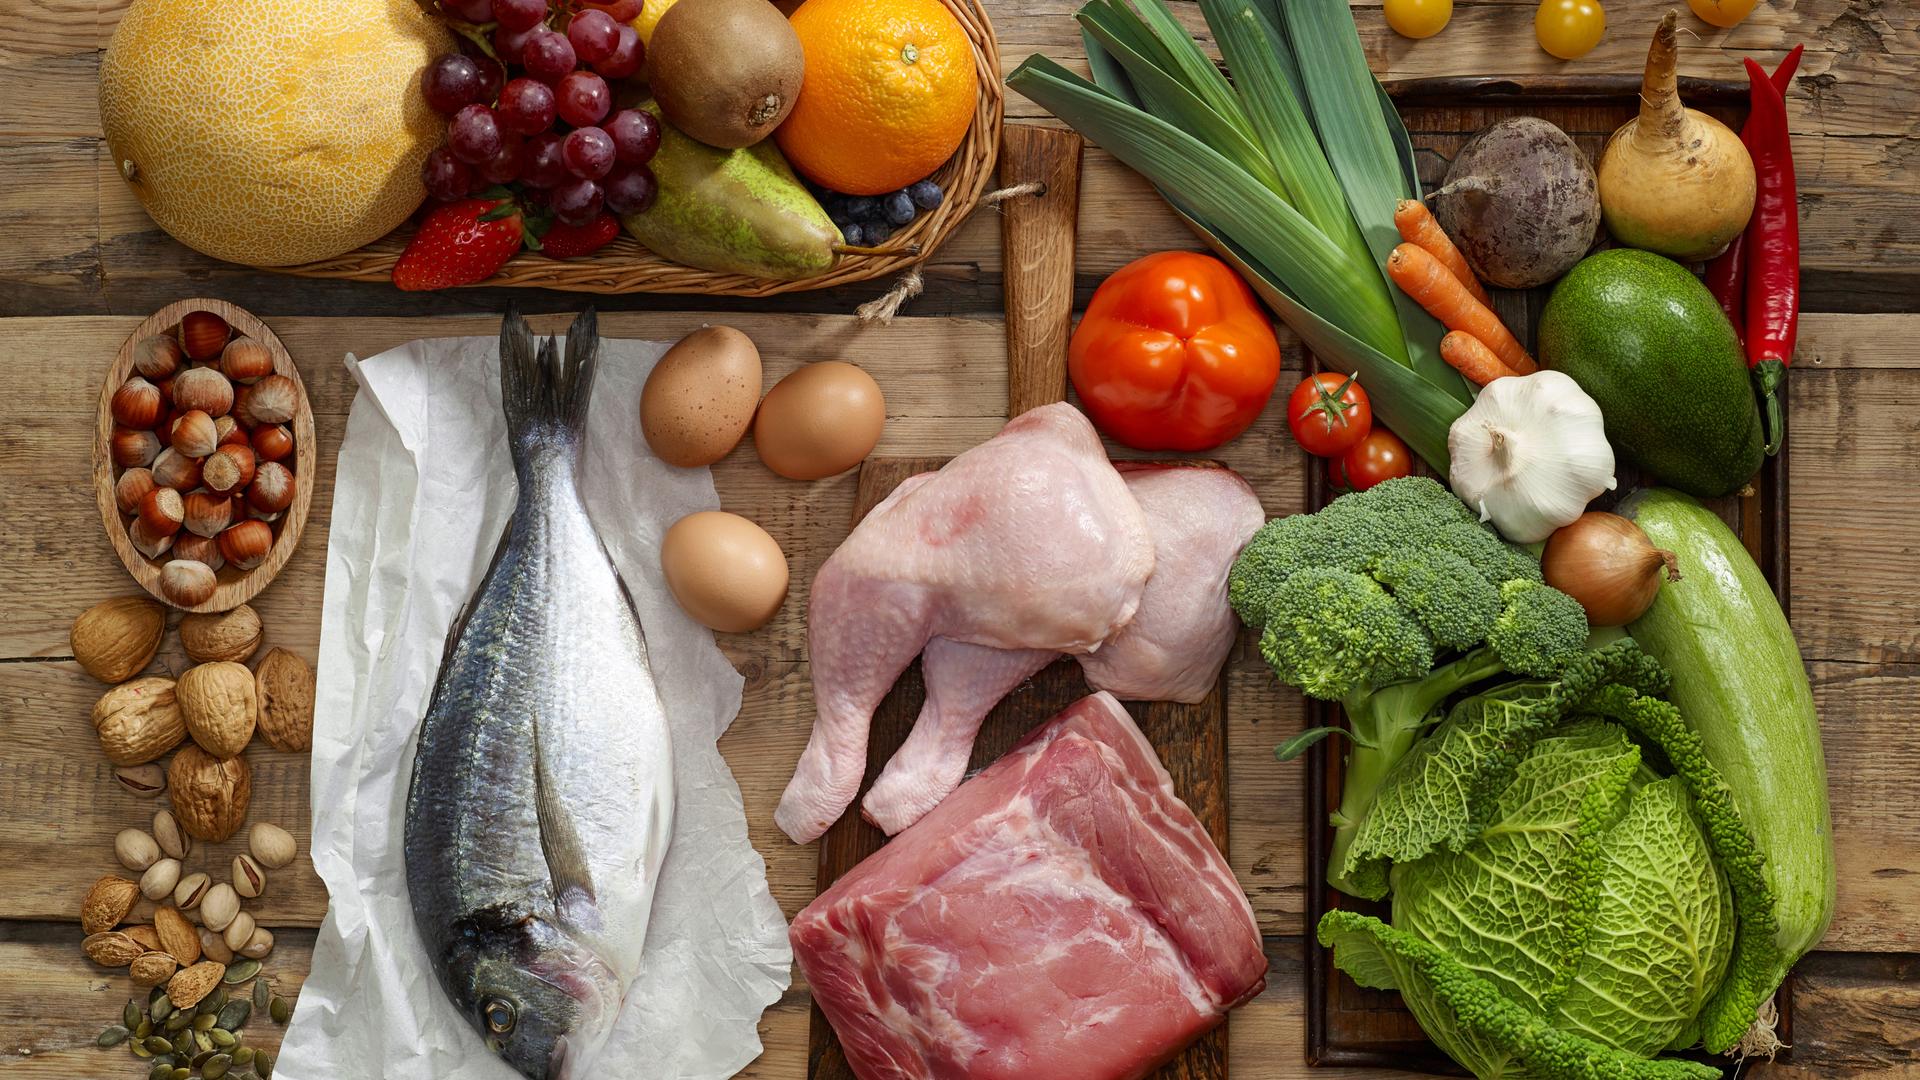 Na czym polega problem z dietą paleo?